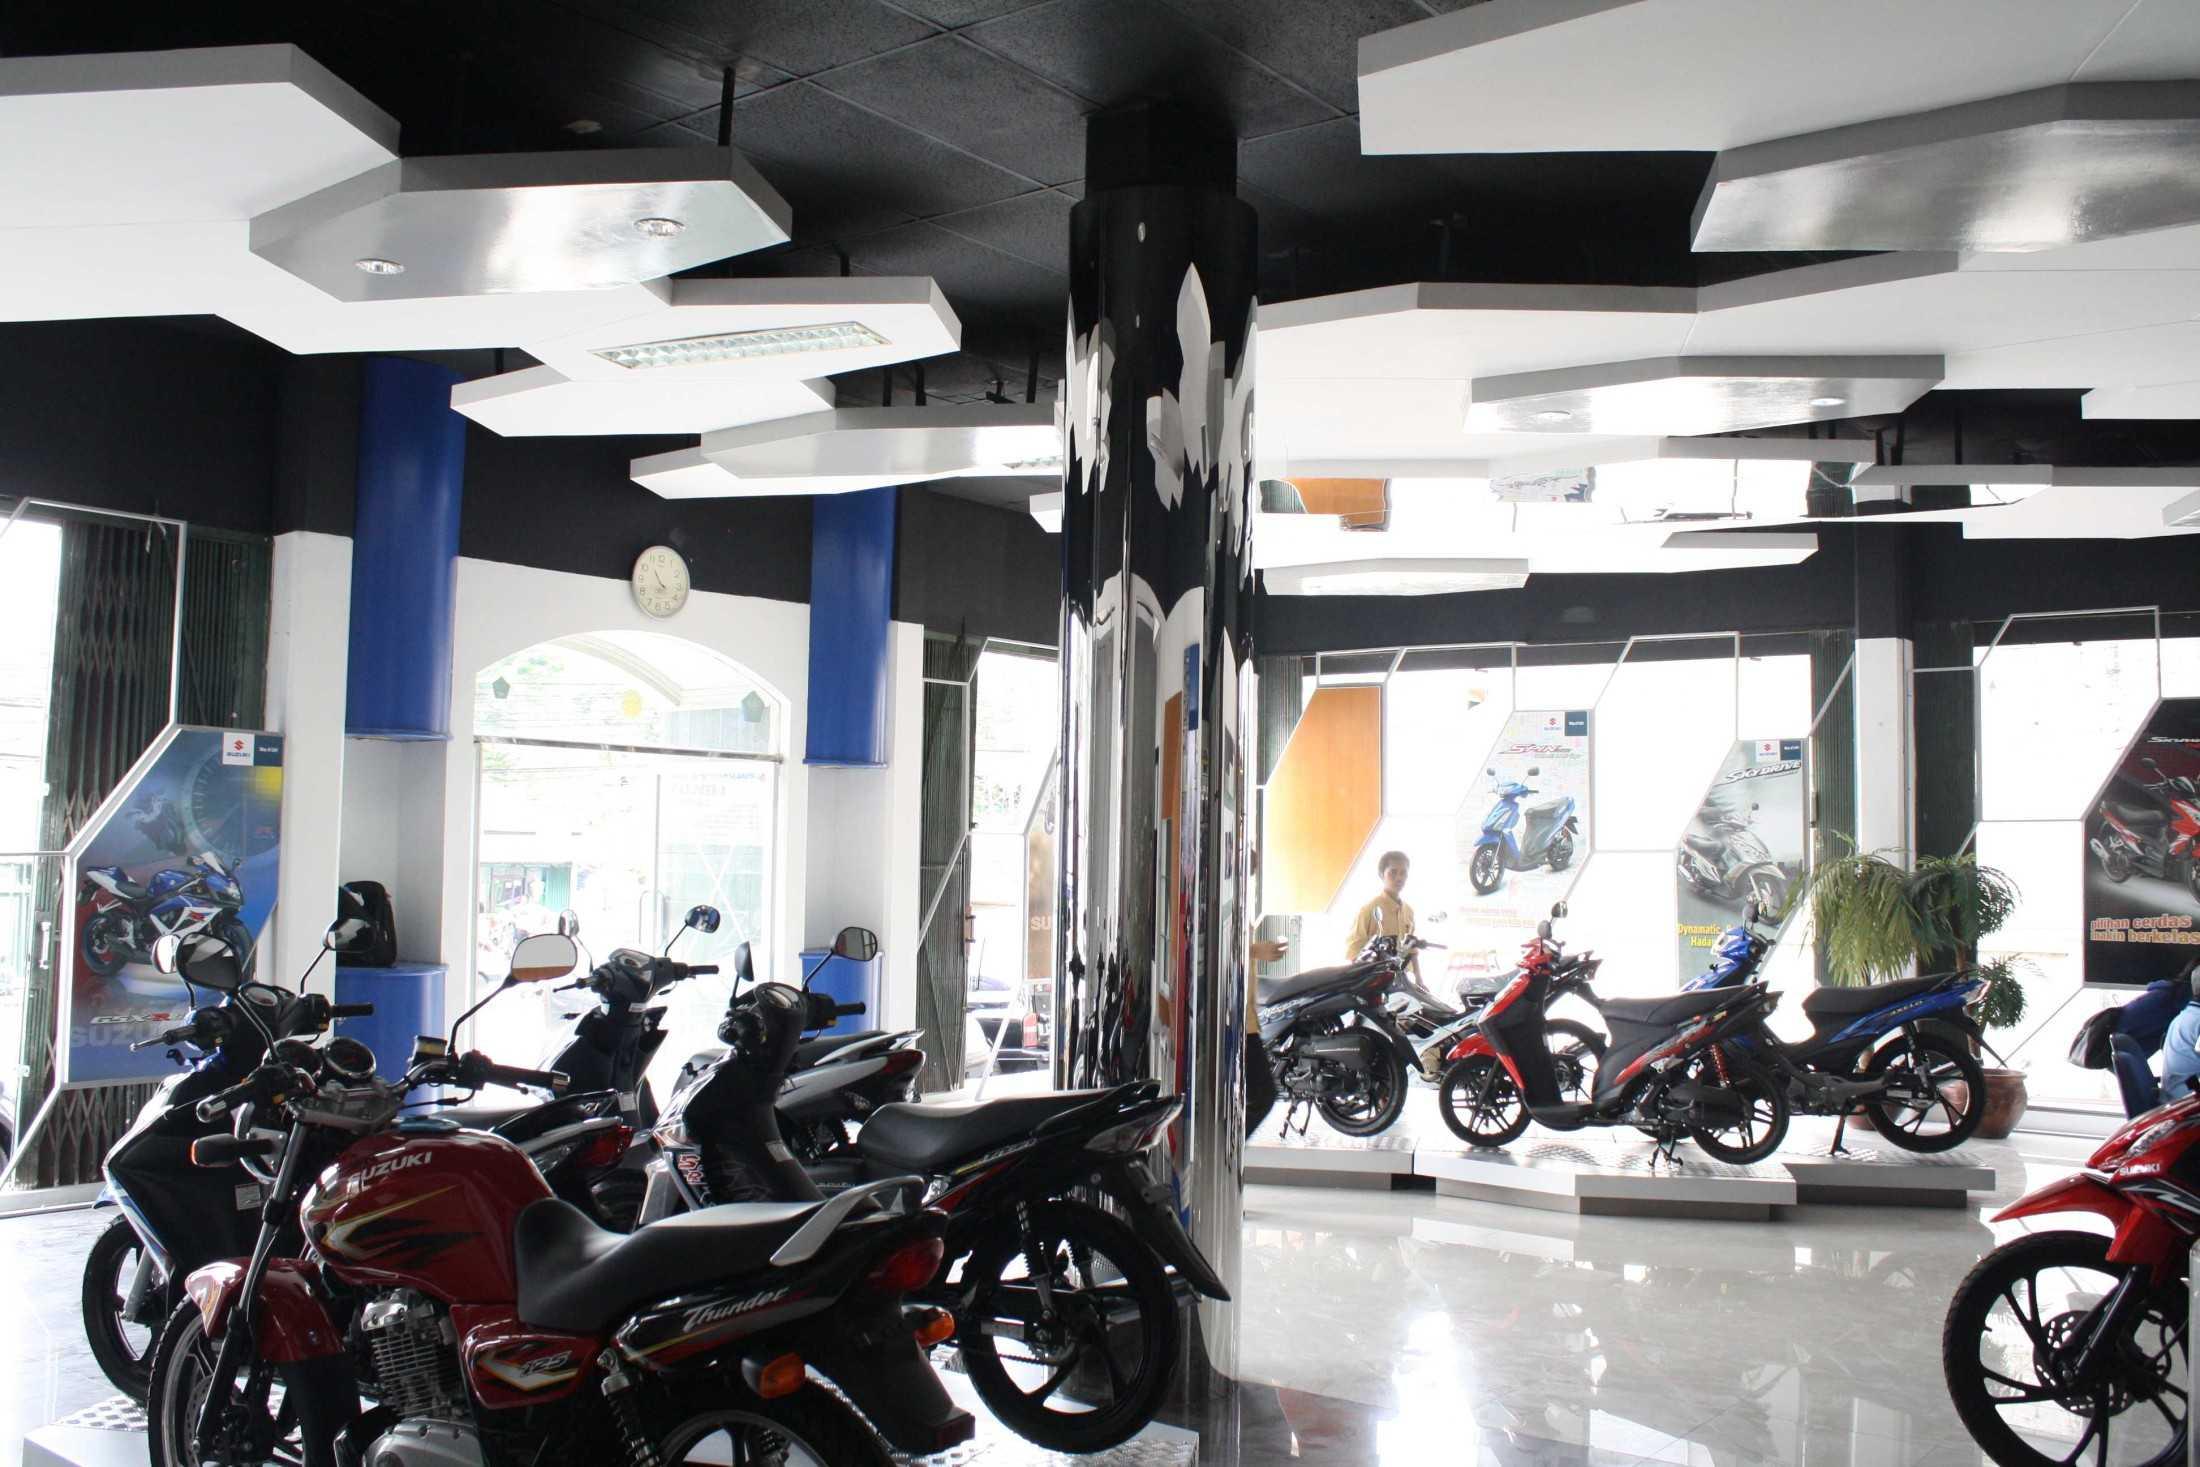 Im Design Associates Suzuki Showroom Kota Jakarta Pusat, Daerah Khusus Ibukota Jakarta, Indonesia Kota Jakarta Pusat, Daerah Khusus Ibukota Jakarta, Indonesia Im-Design-Associates-Suzuki-Showroom  73063